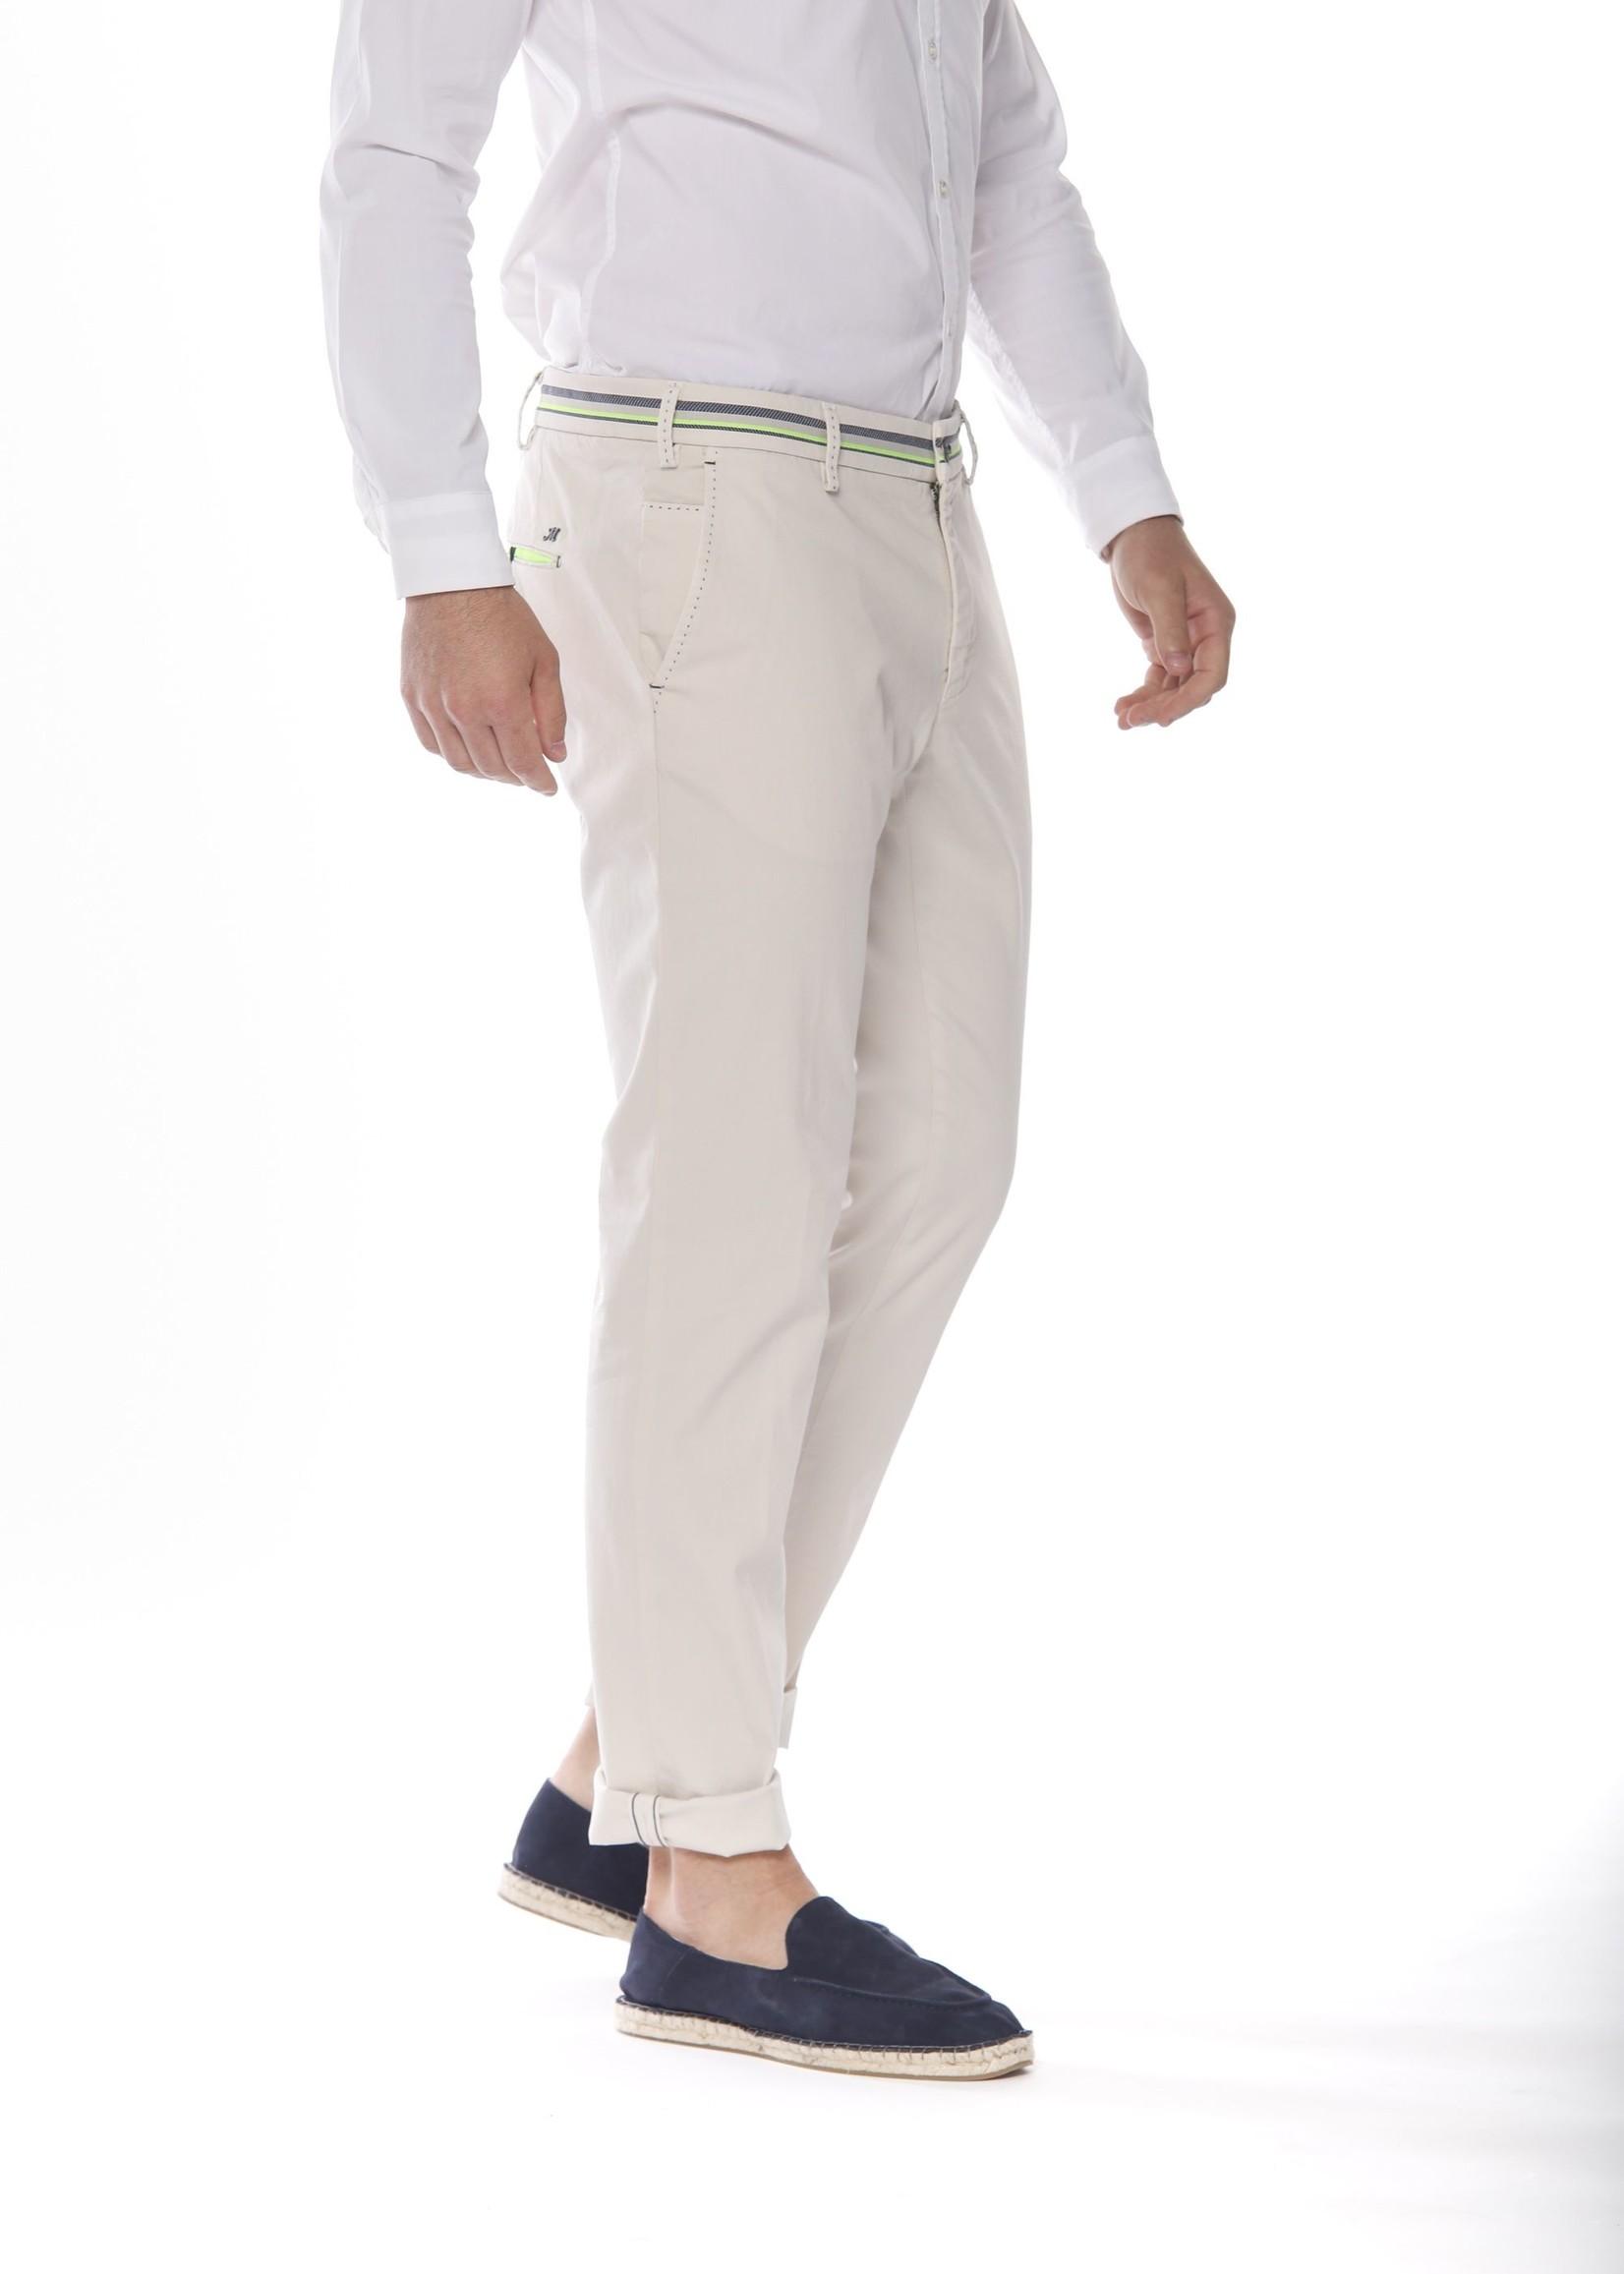 Mason's Pantalon en satin stretch coupe extra slim | Beige | Mason's